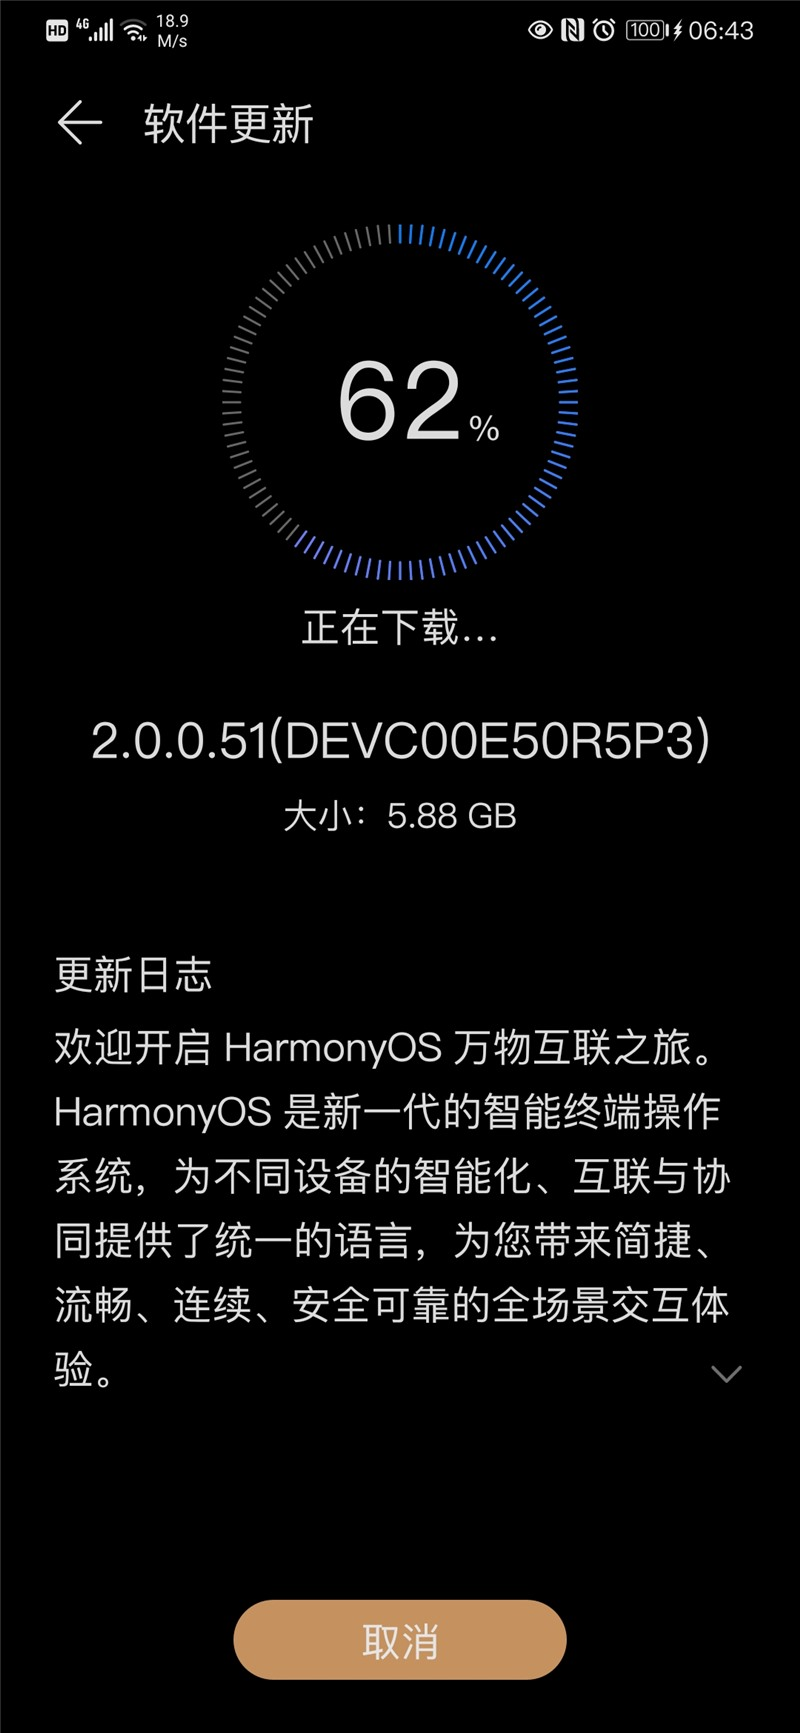 HarmonyOS 2.0 developer public beta version 2.0.0.51 main